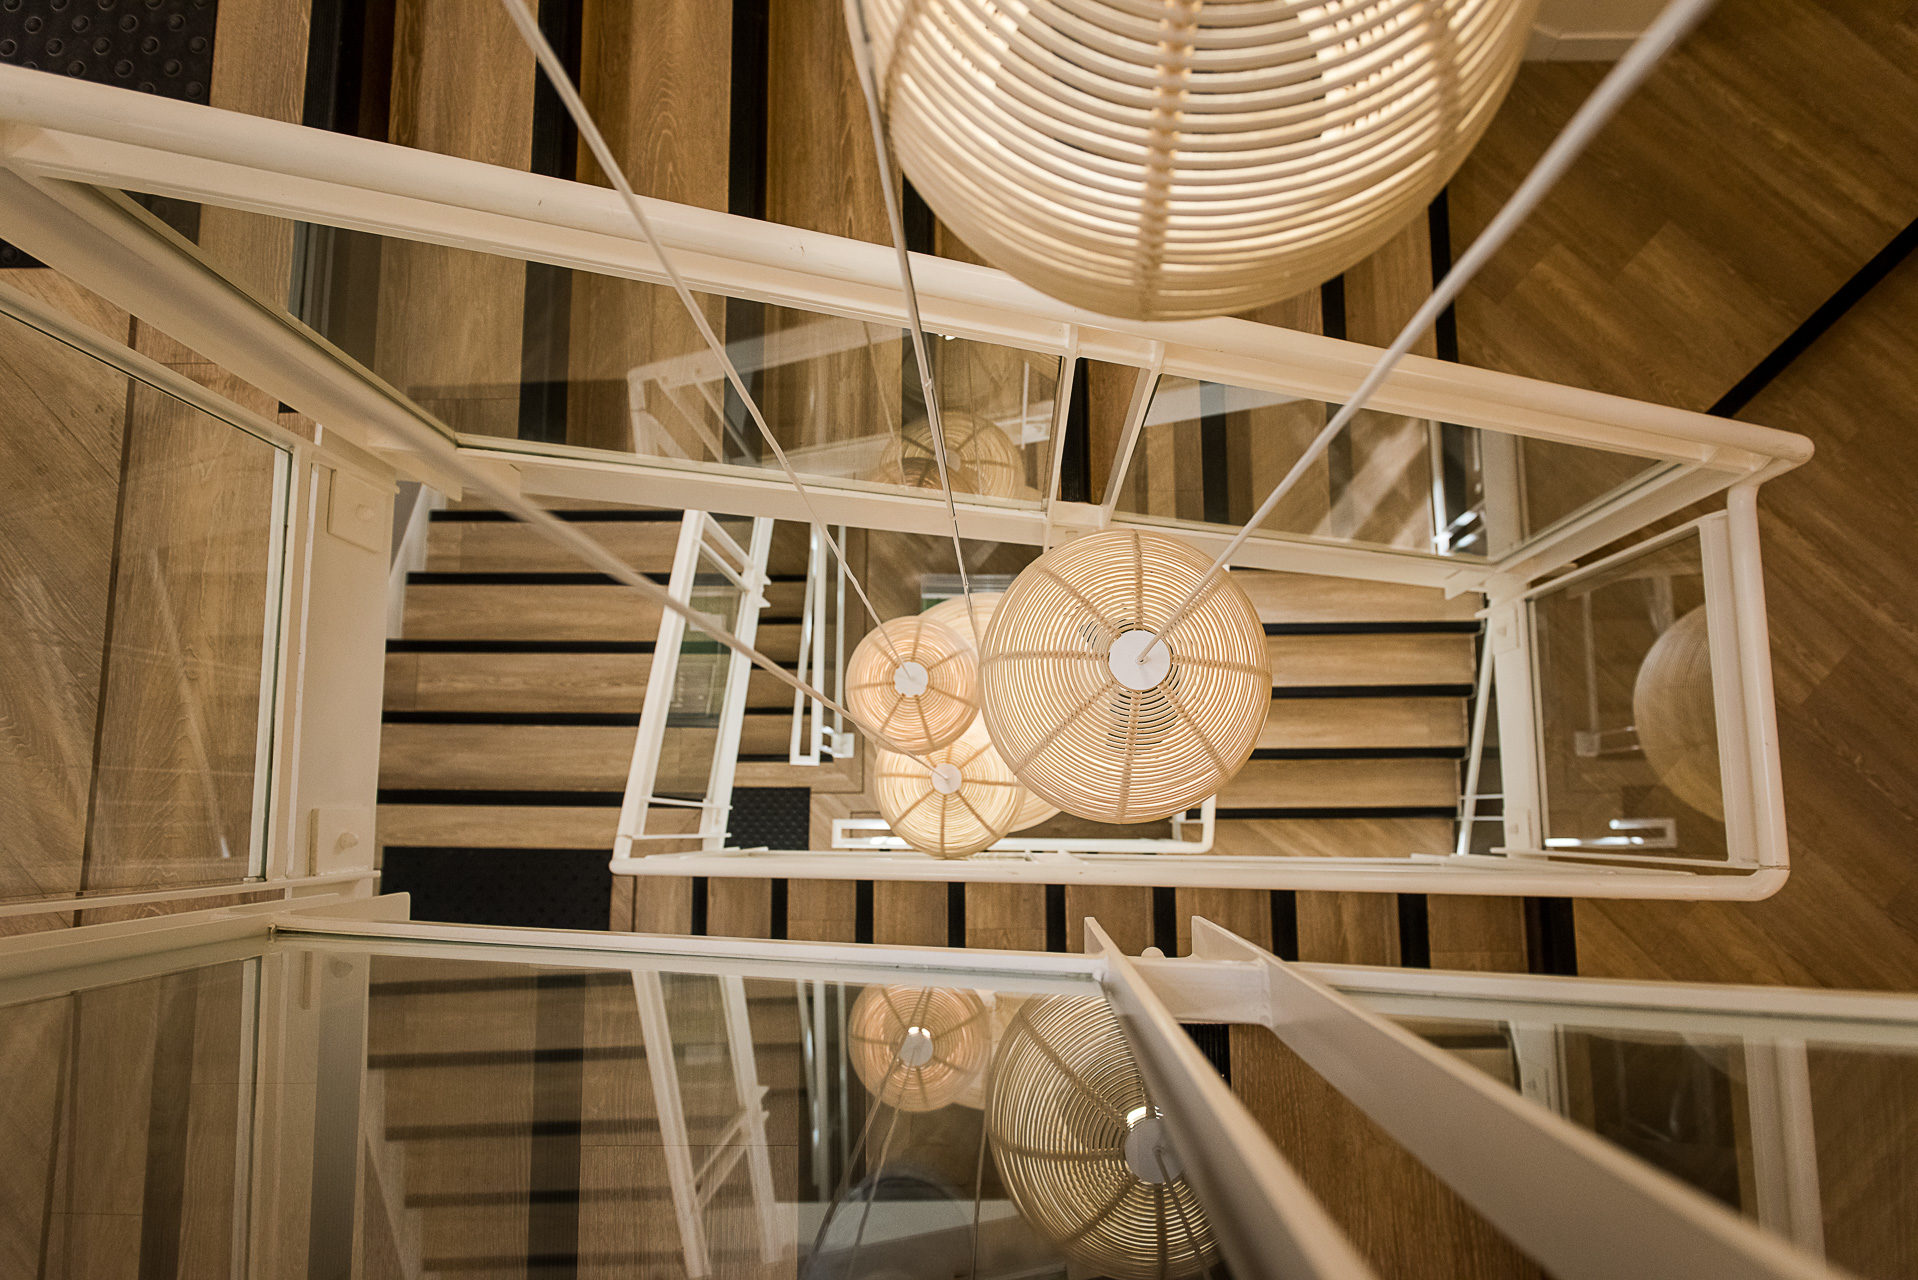 photographe-interieur-batiment-residence-yvelines-2